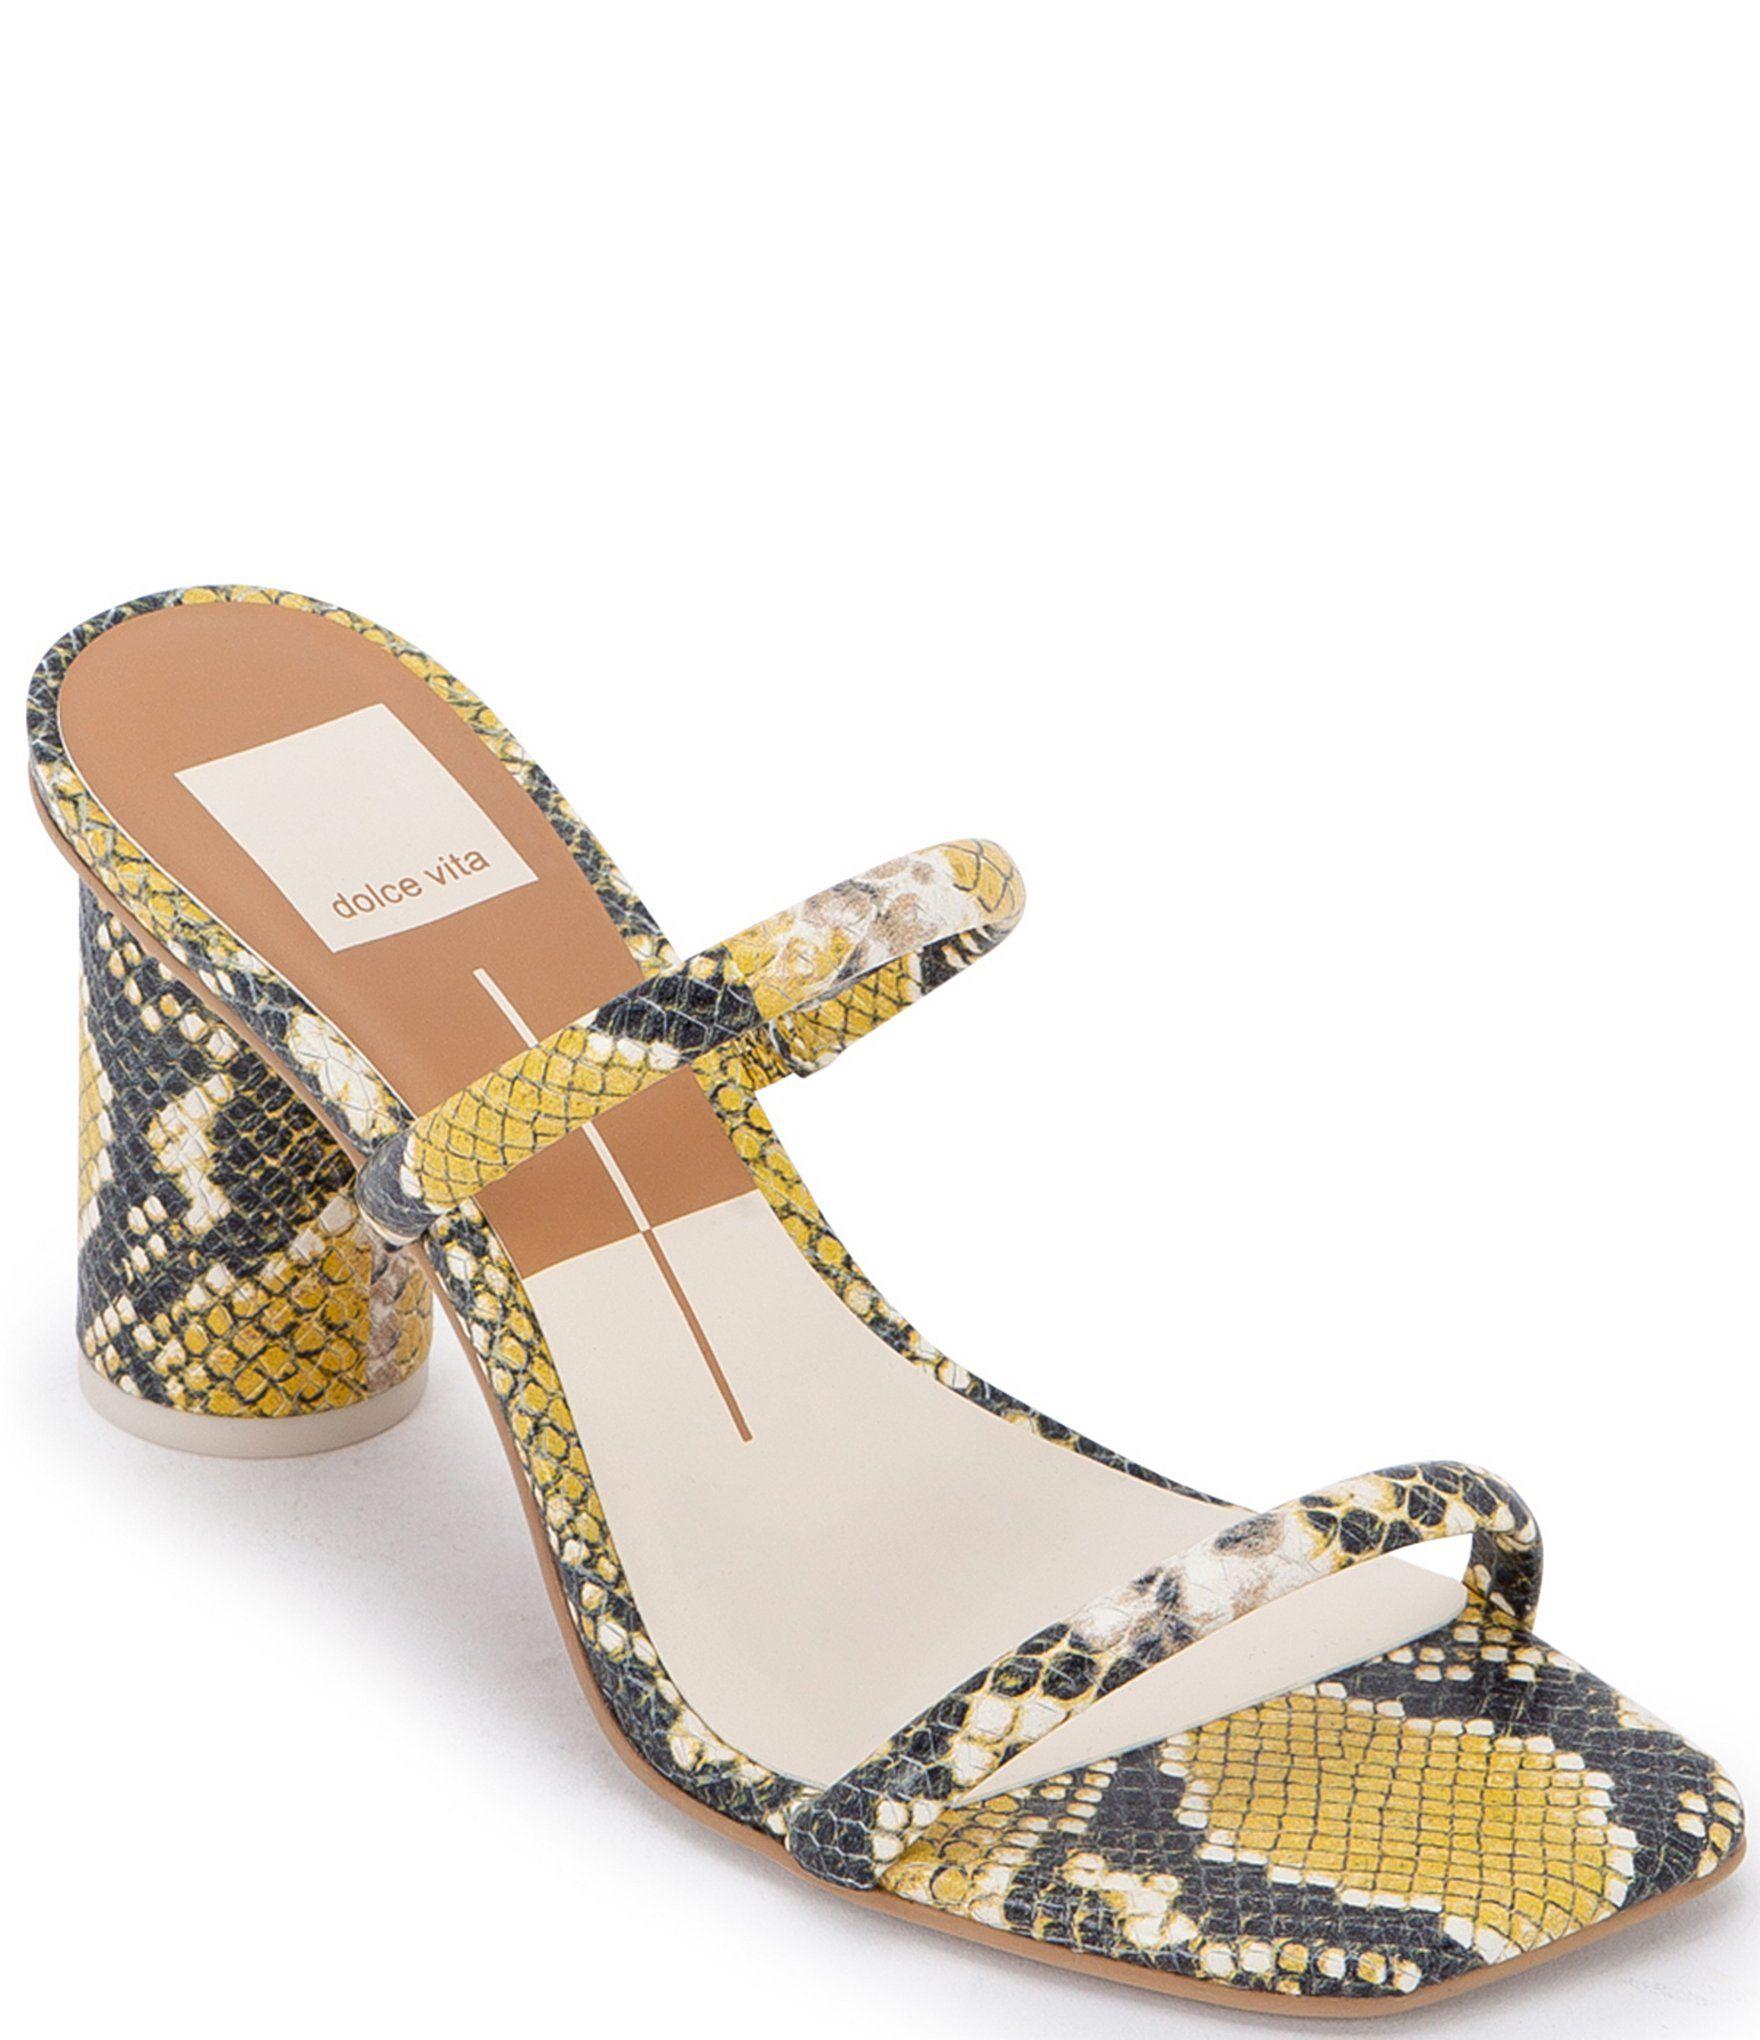 Dolce Vita Noles Square Toe Snake Print Leather Sandals –  9.5M